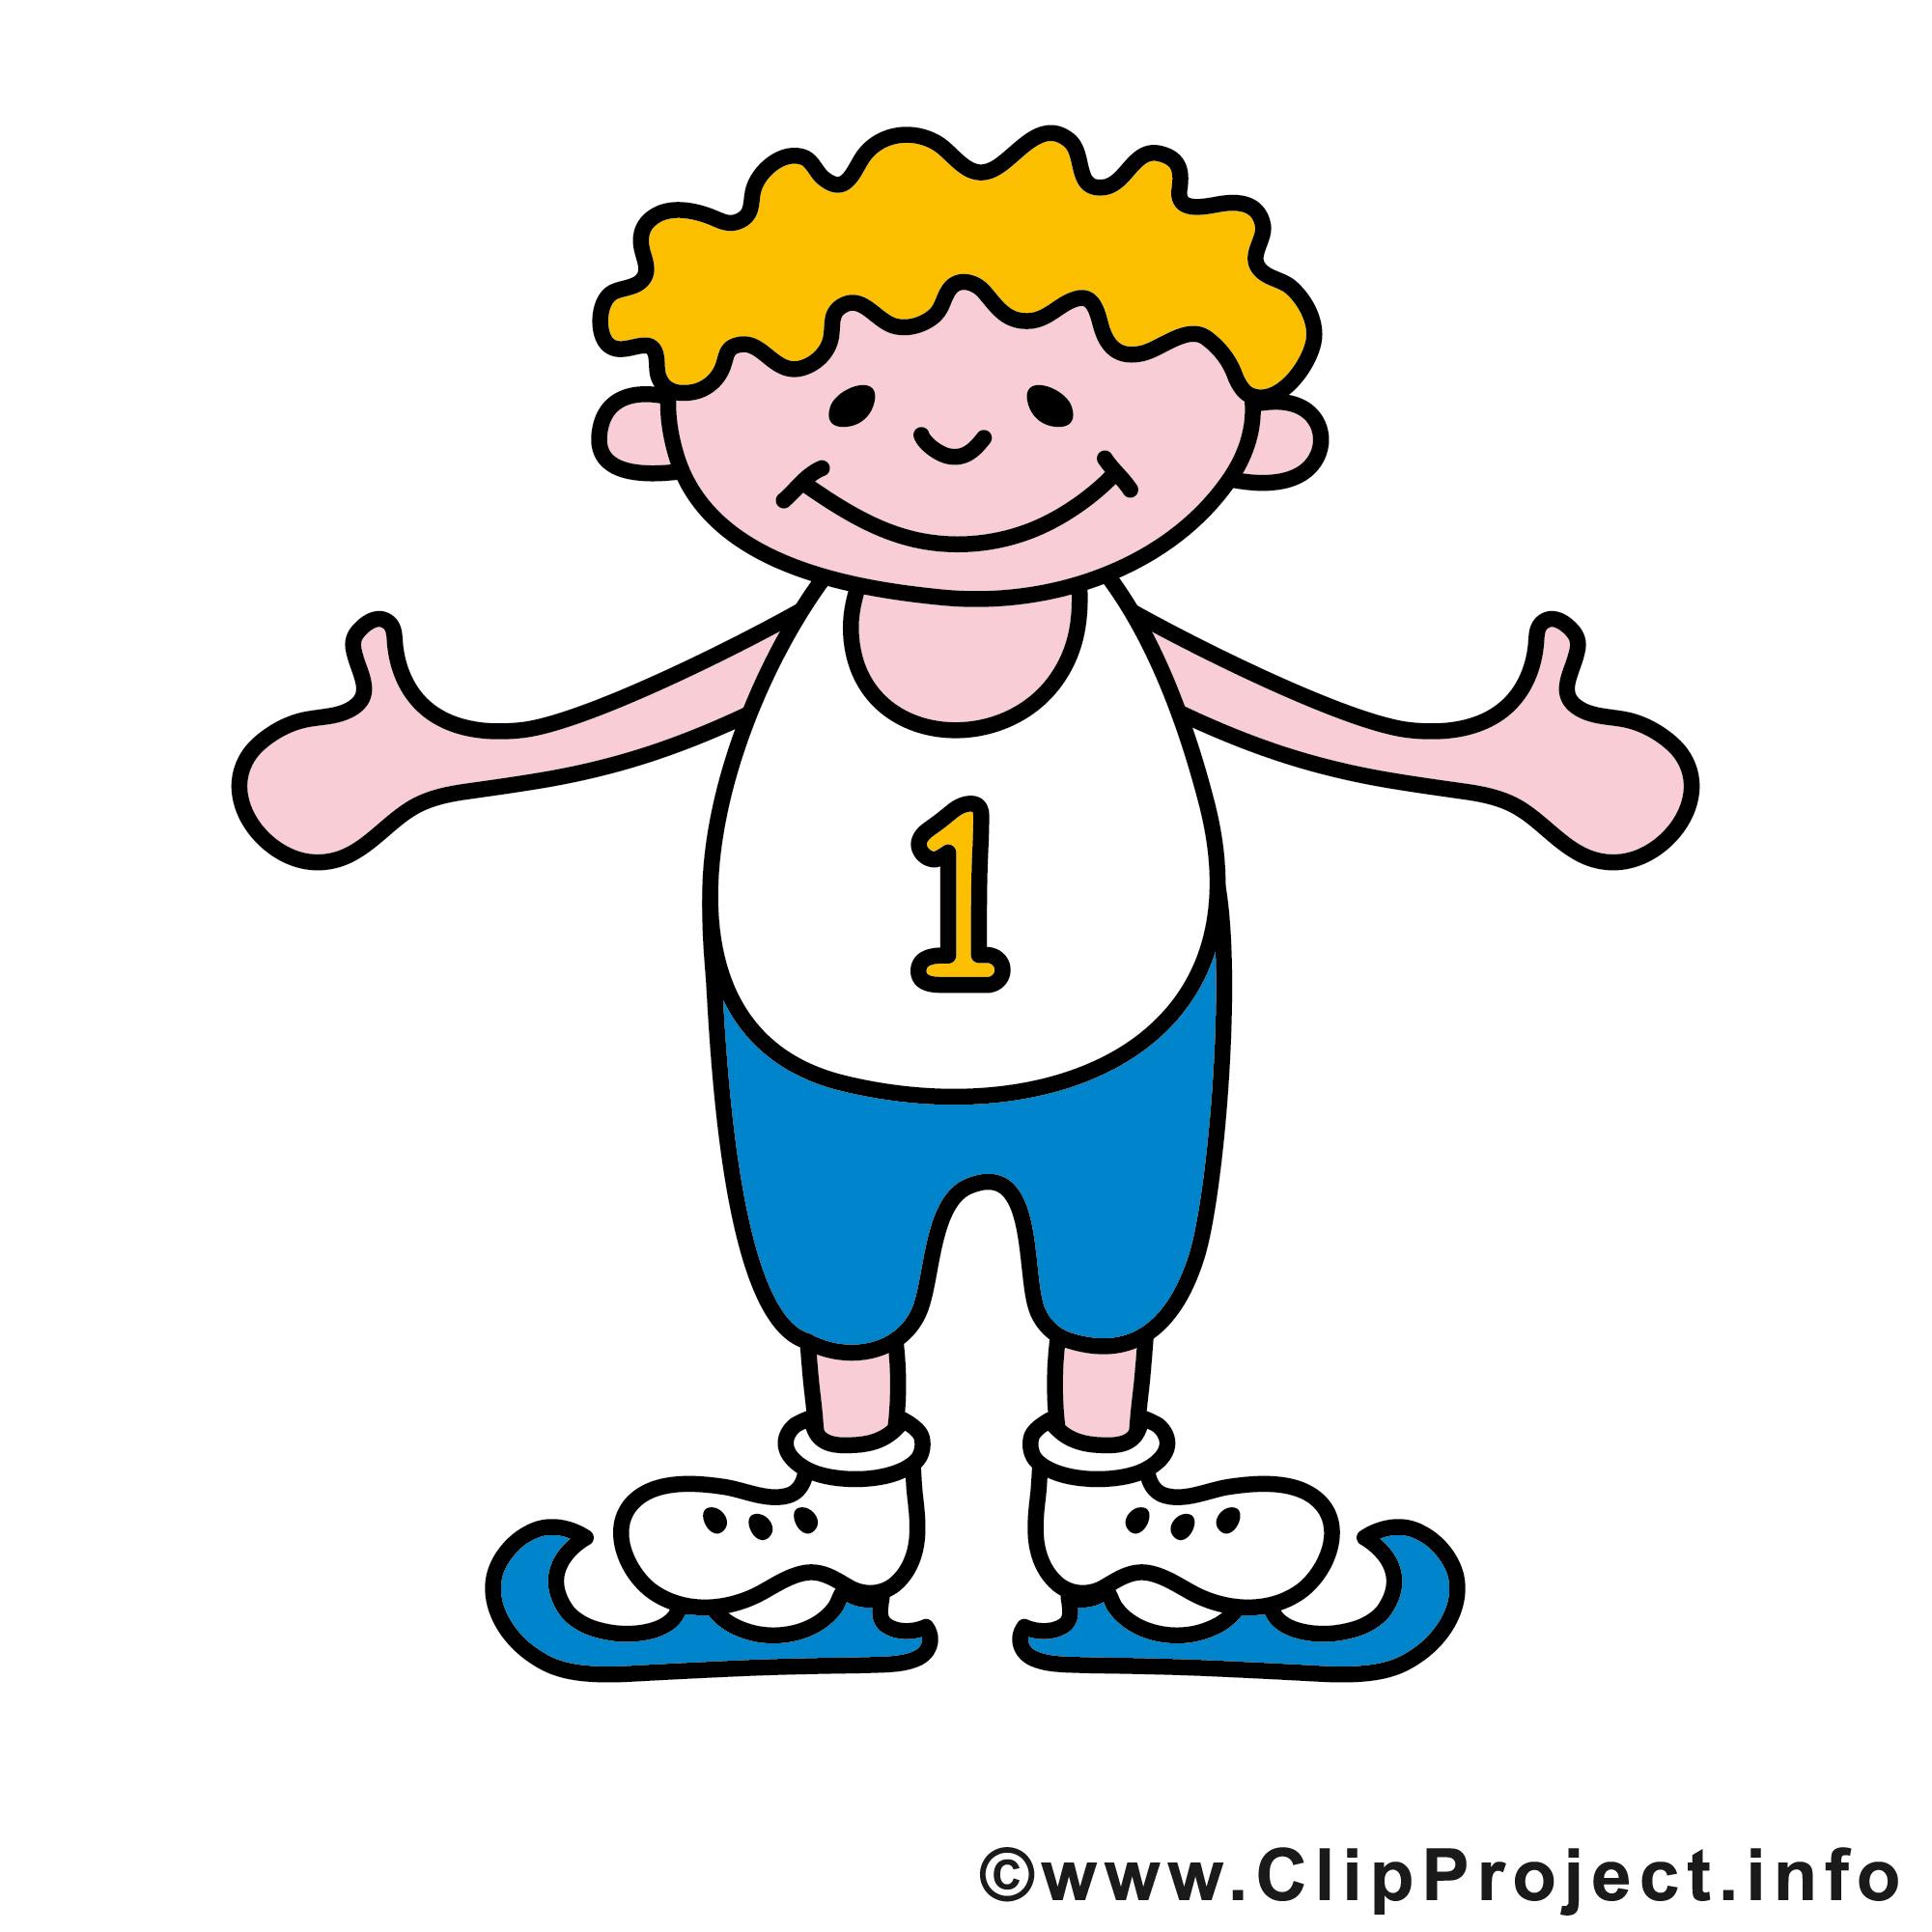 Bilder clipart clip art library download Sport Bilder, Cliparts, Cartoons, Grafiken, Illustrationen, Gifs ... clip art library download